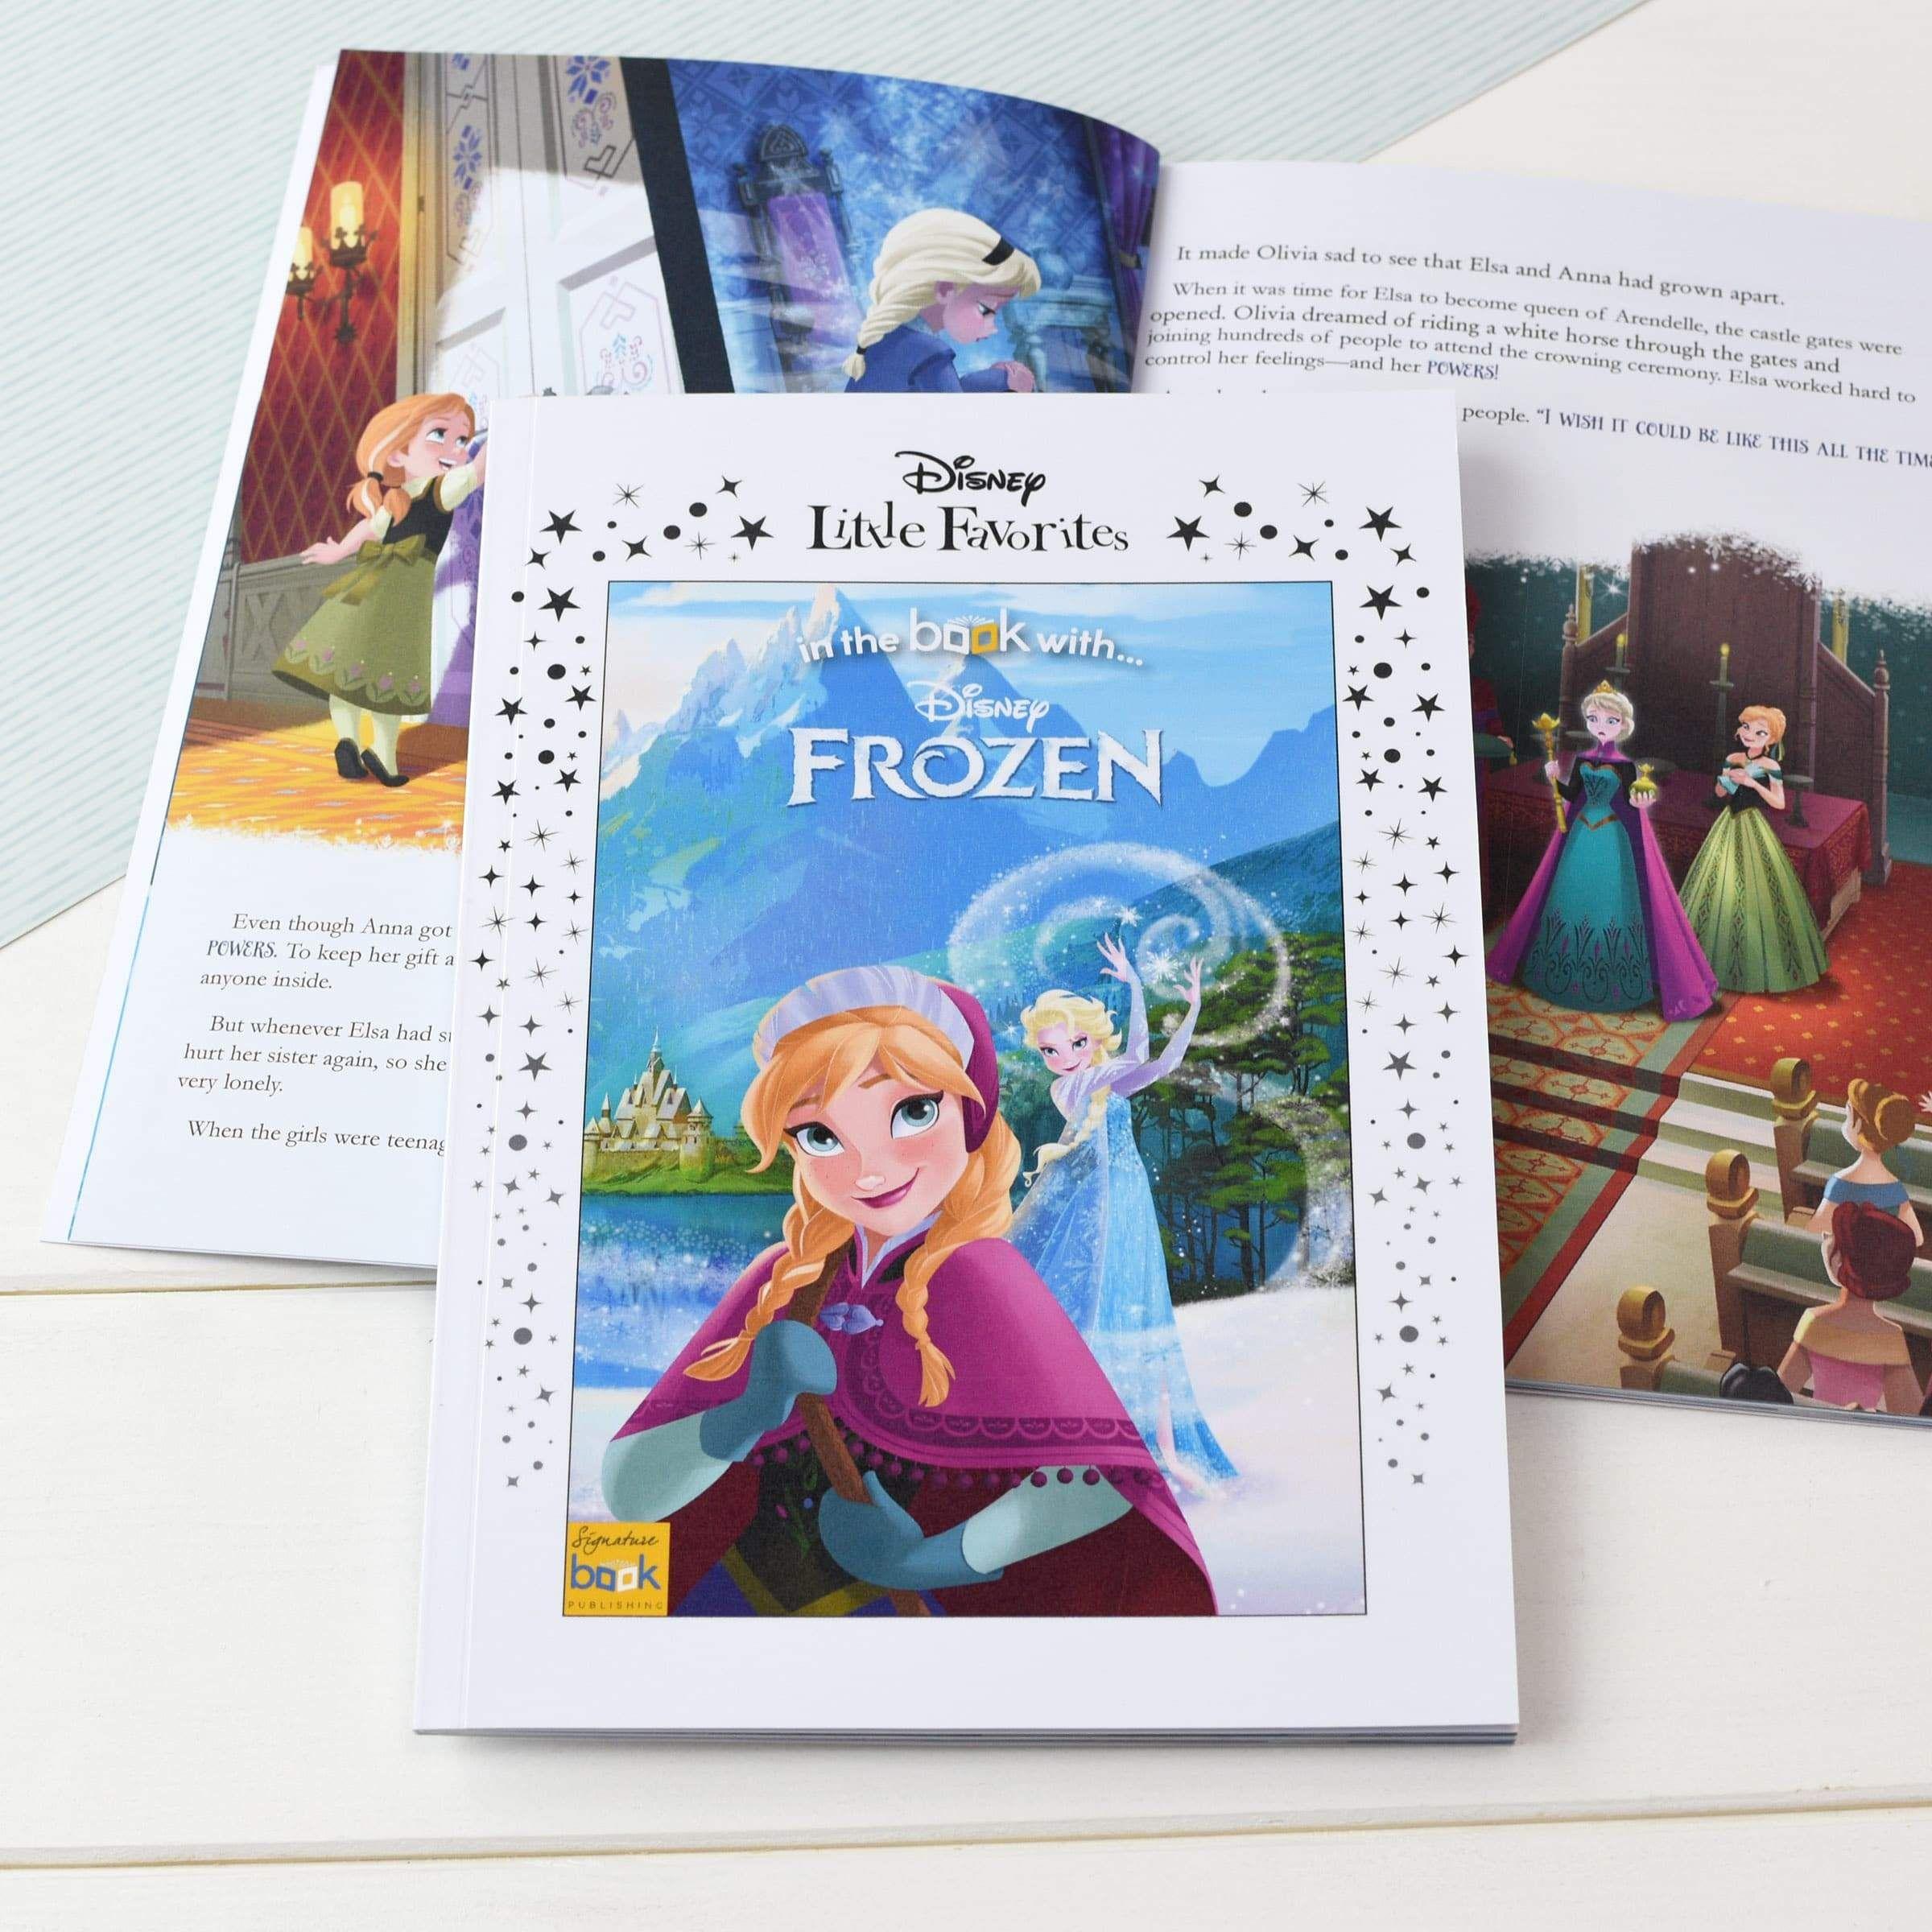 Disney Little Favorites Frozen Personalized Book for Kids   Custom Toddler Book